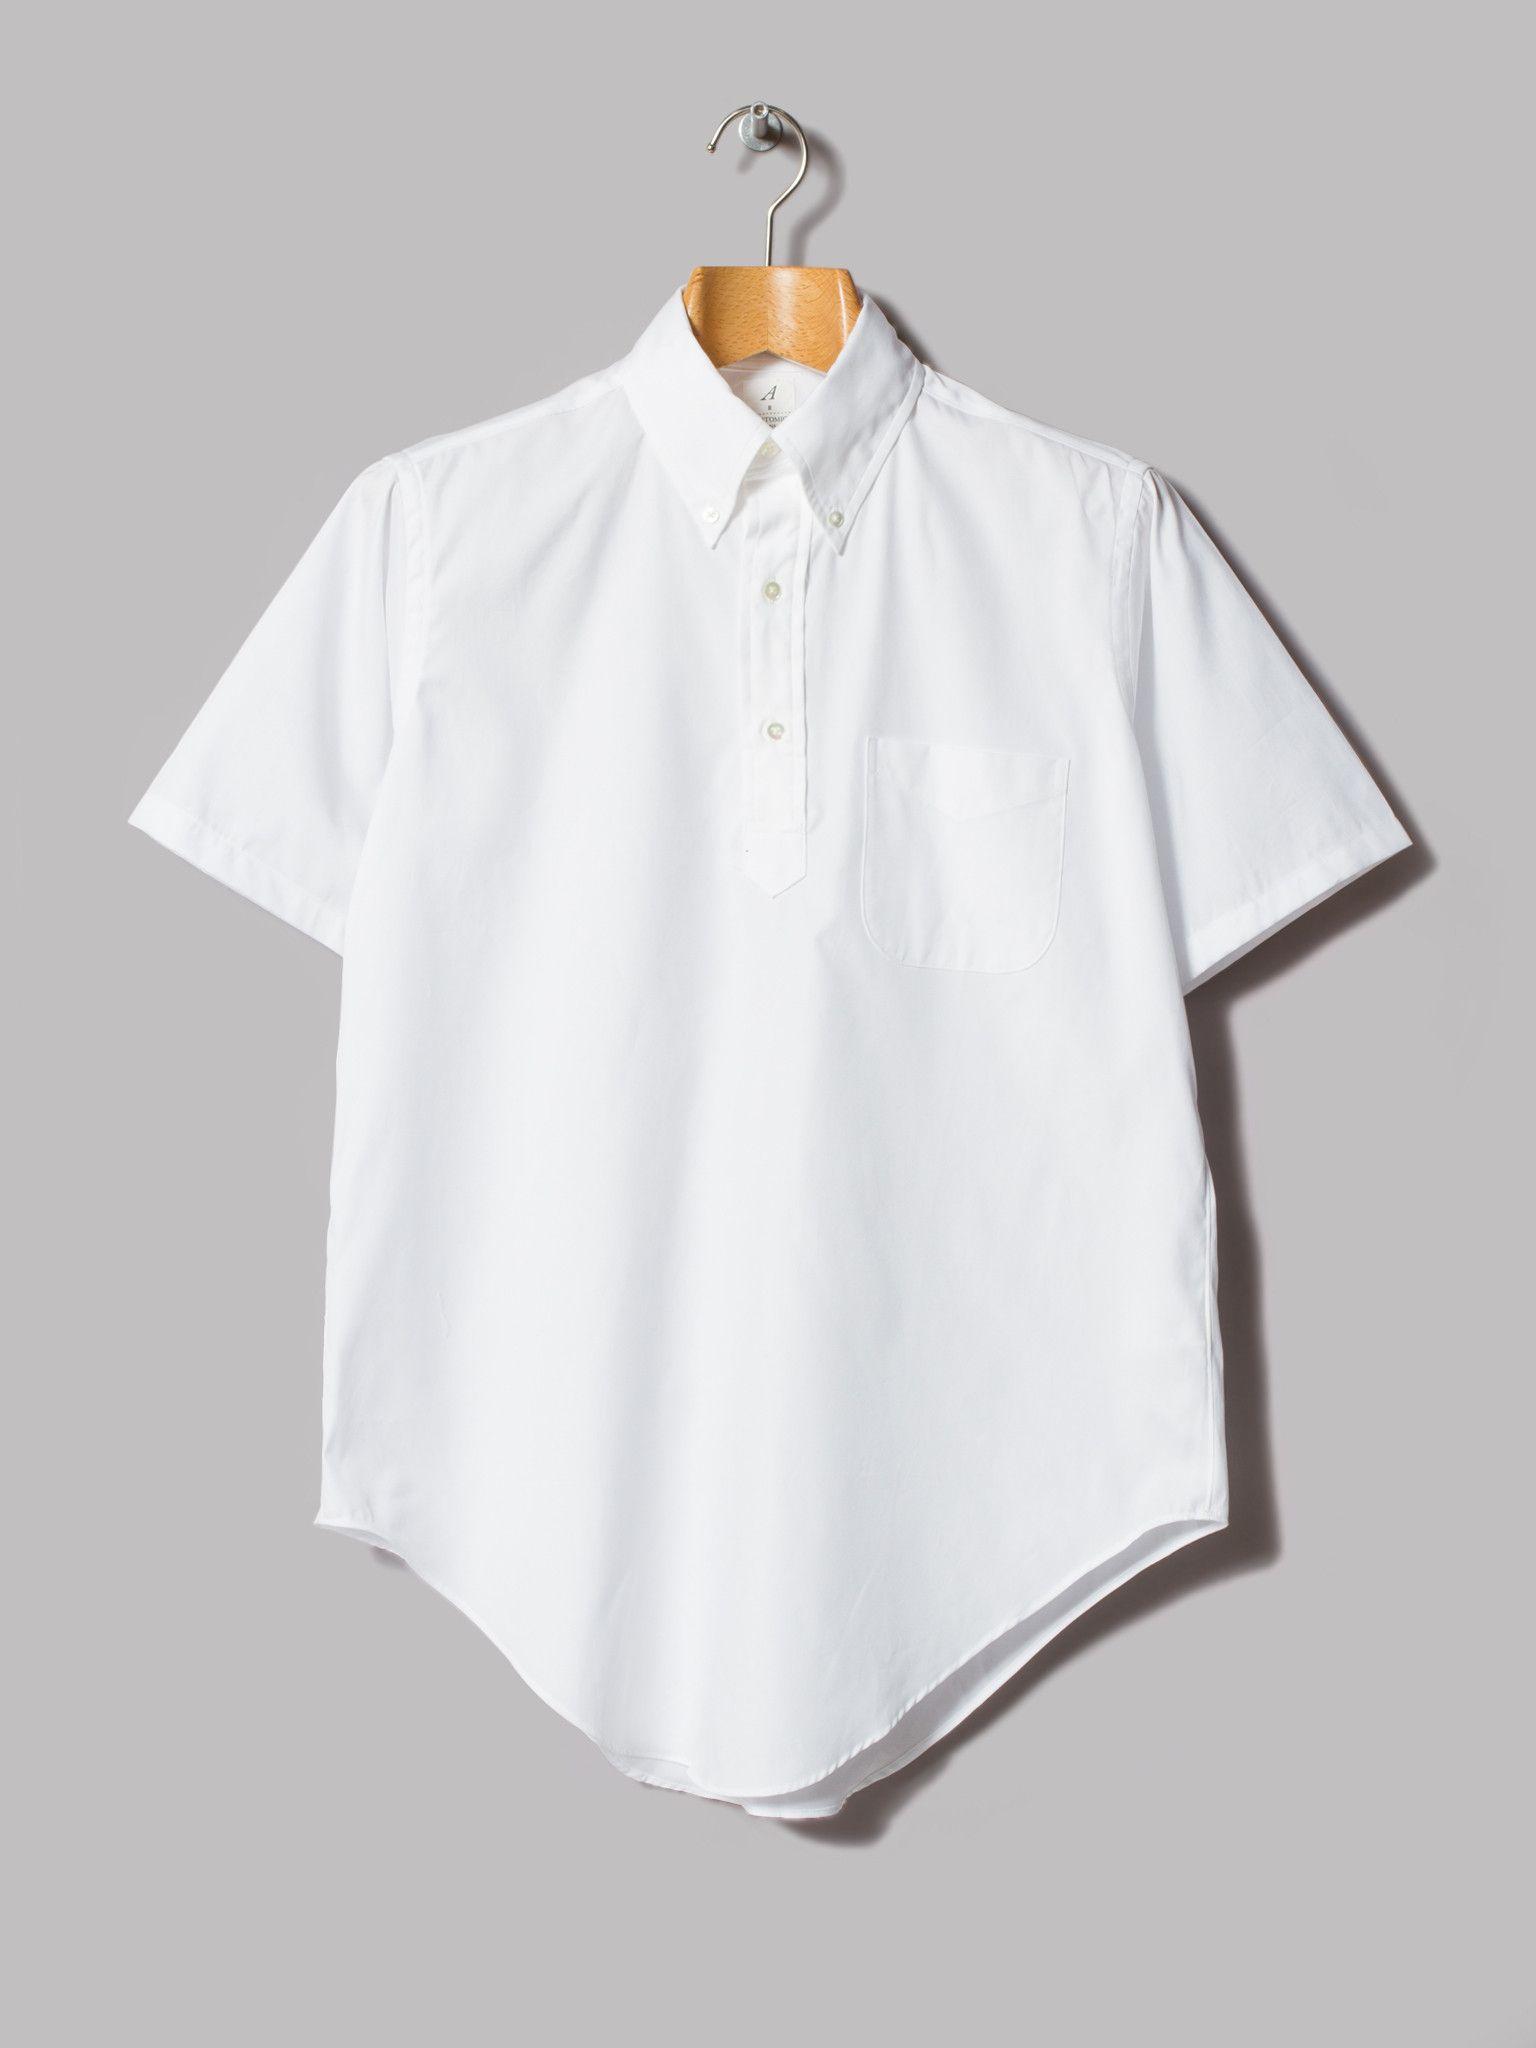 Frenchmen Clothing Short Sleeve Oxford